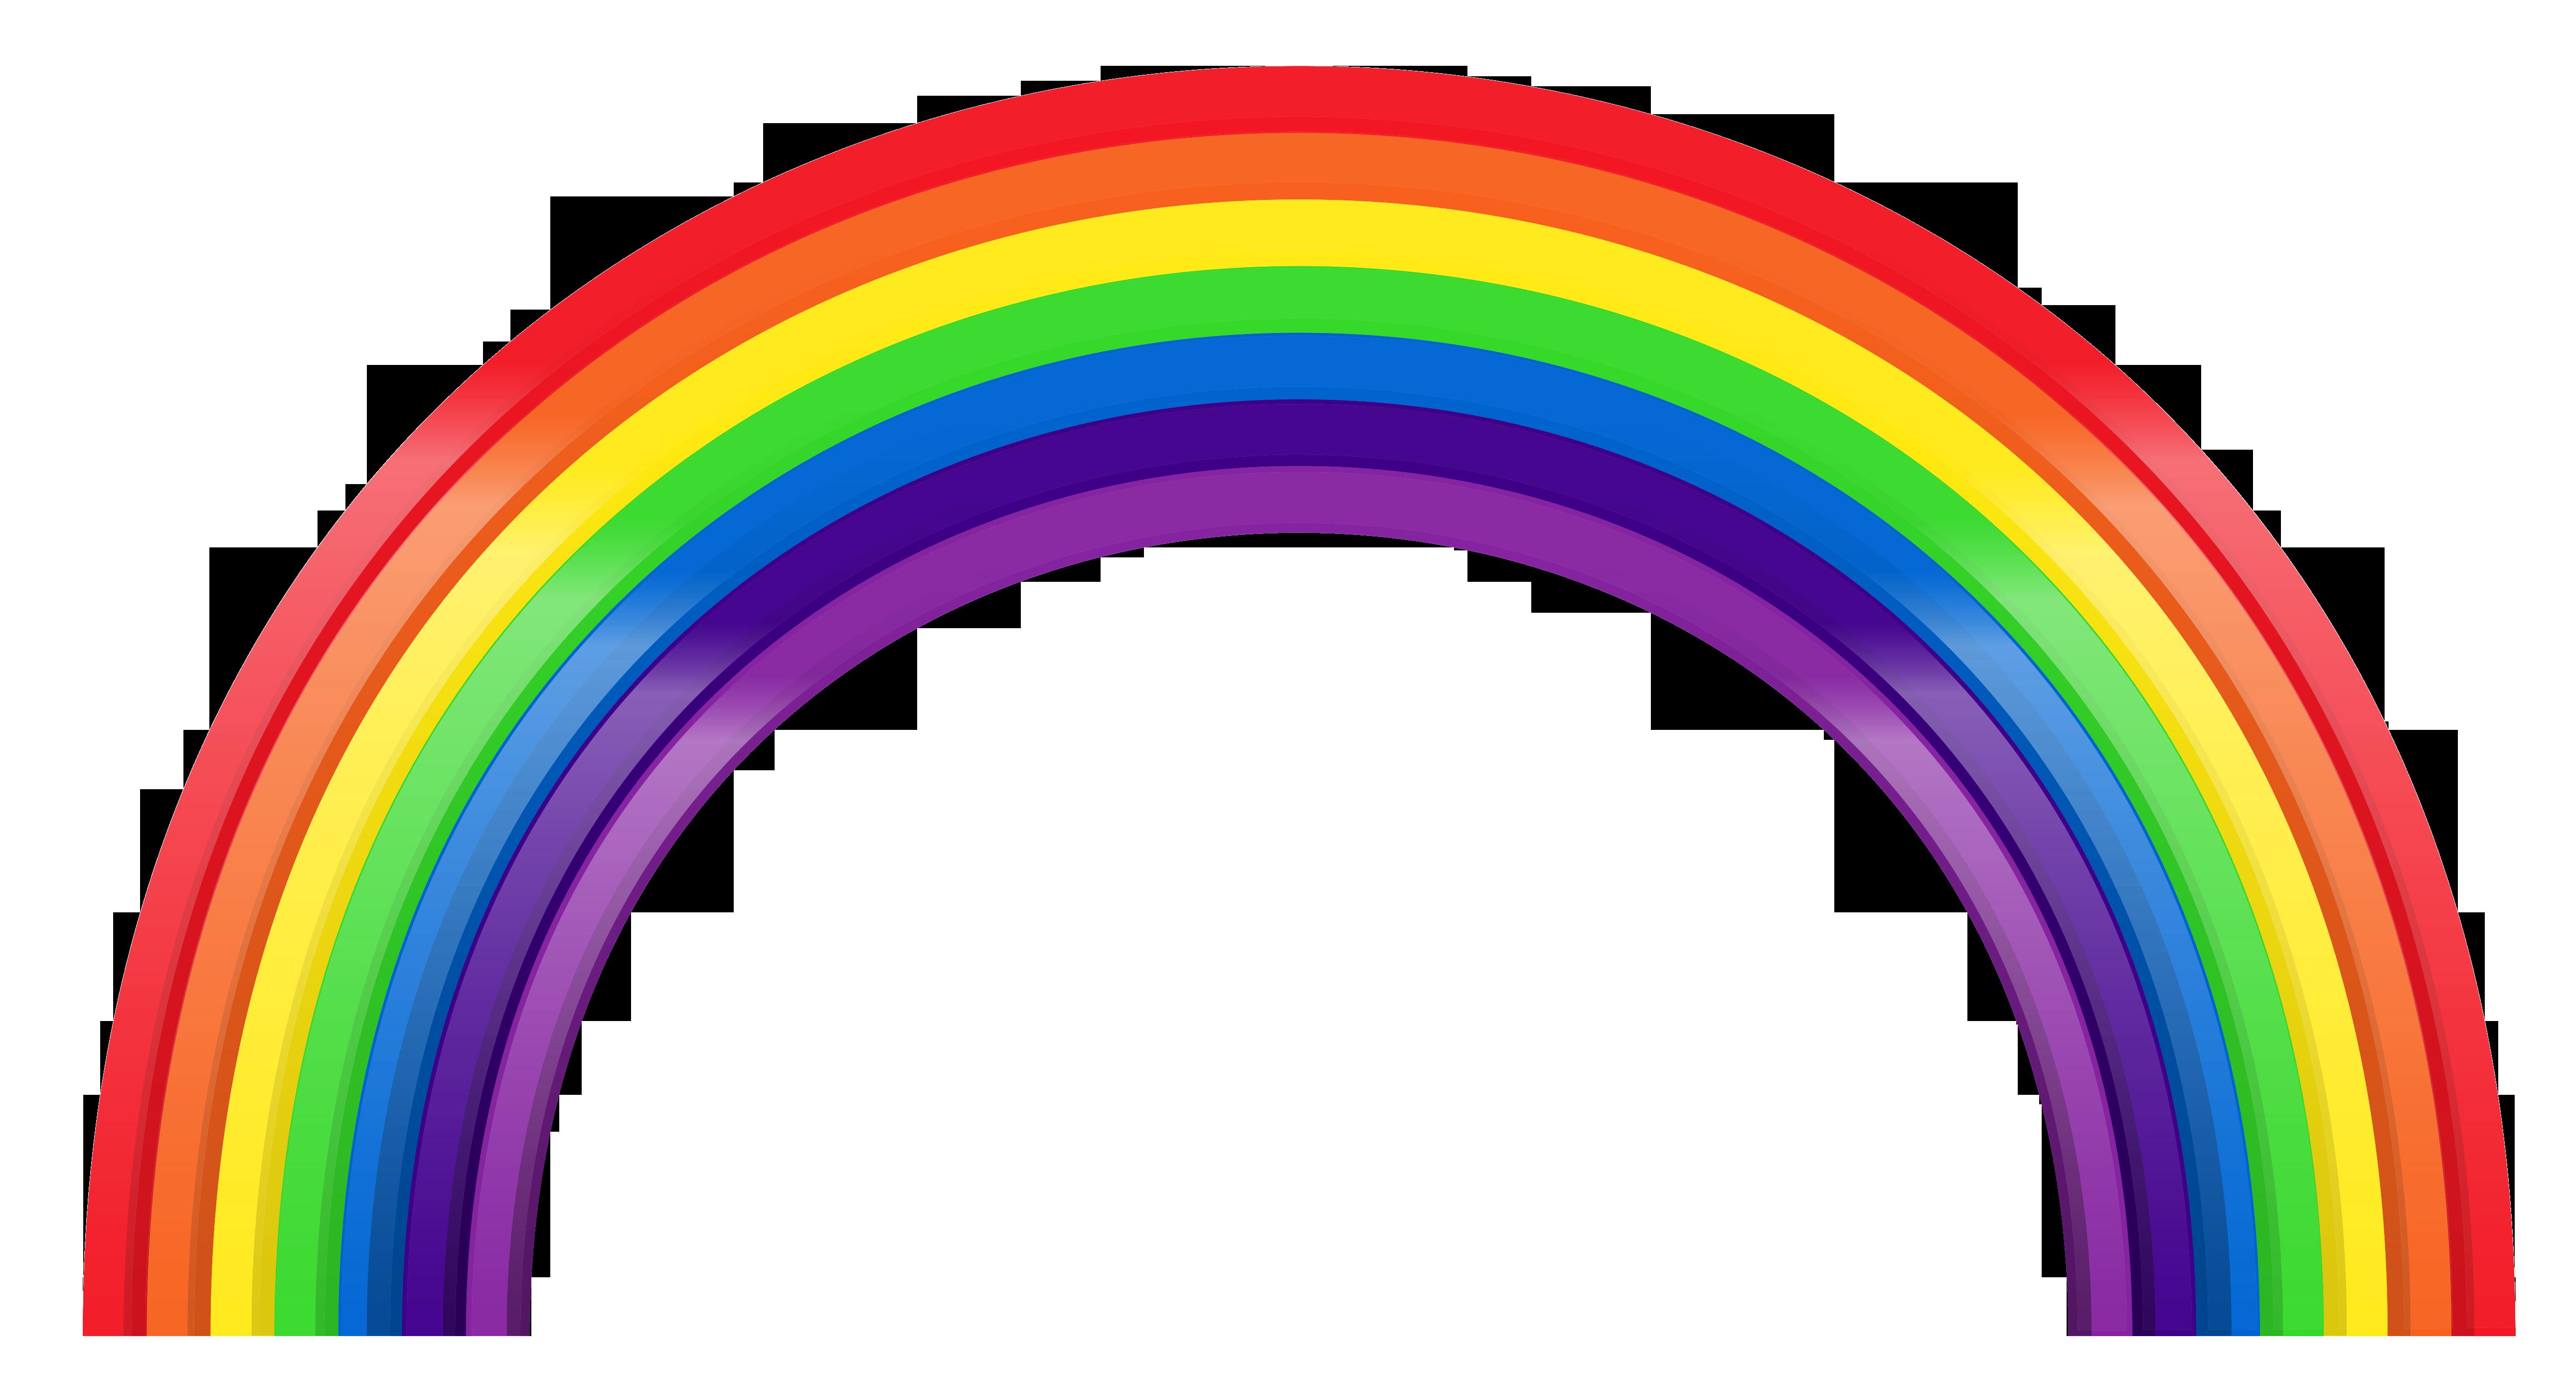 Rainbow clipart transparent 2 » Clipart Station.